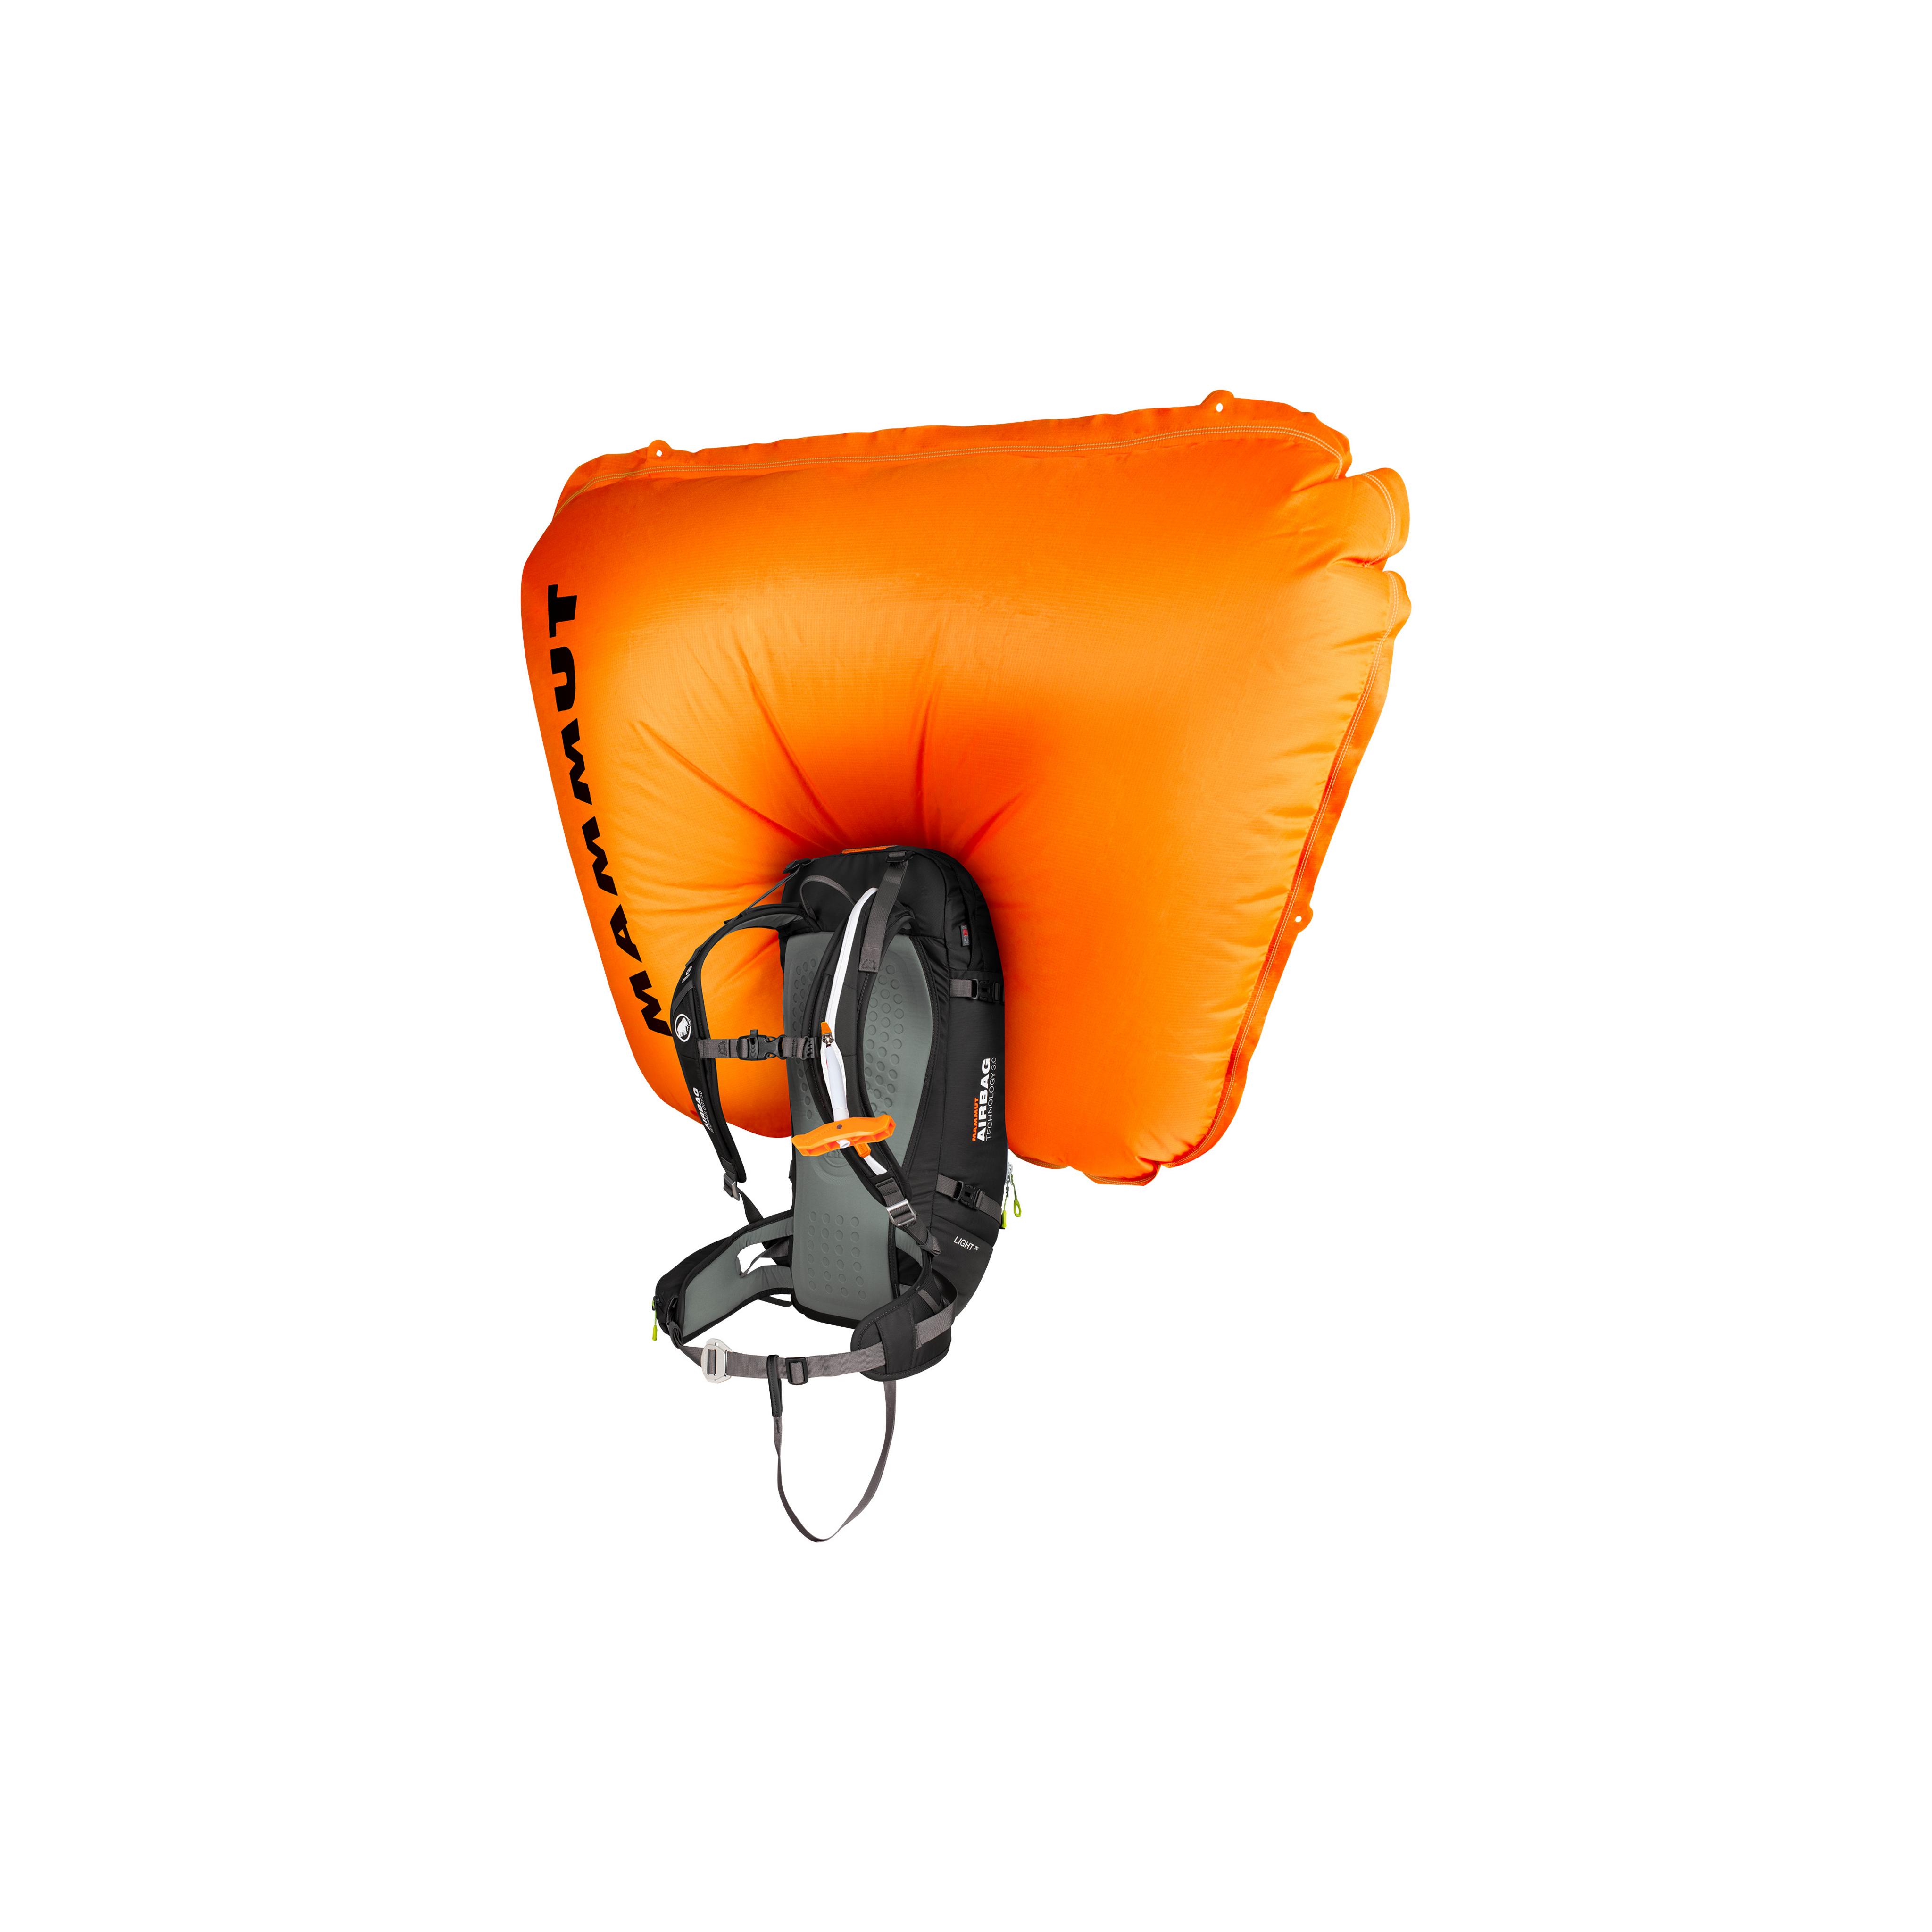 Light Removable Airbag 3.0 - 30 L, graphite thumbnail